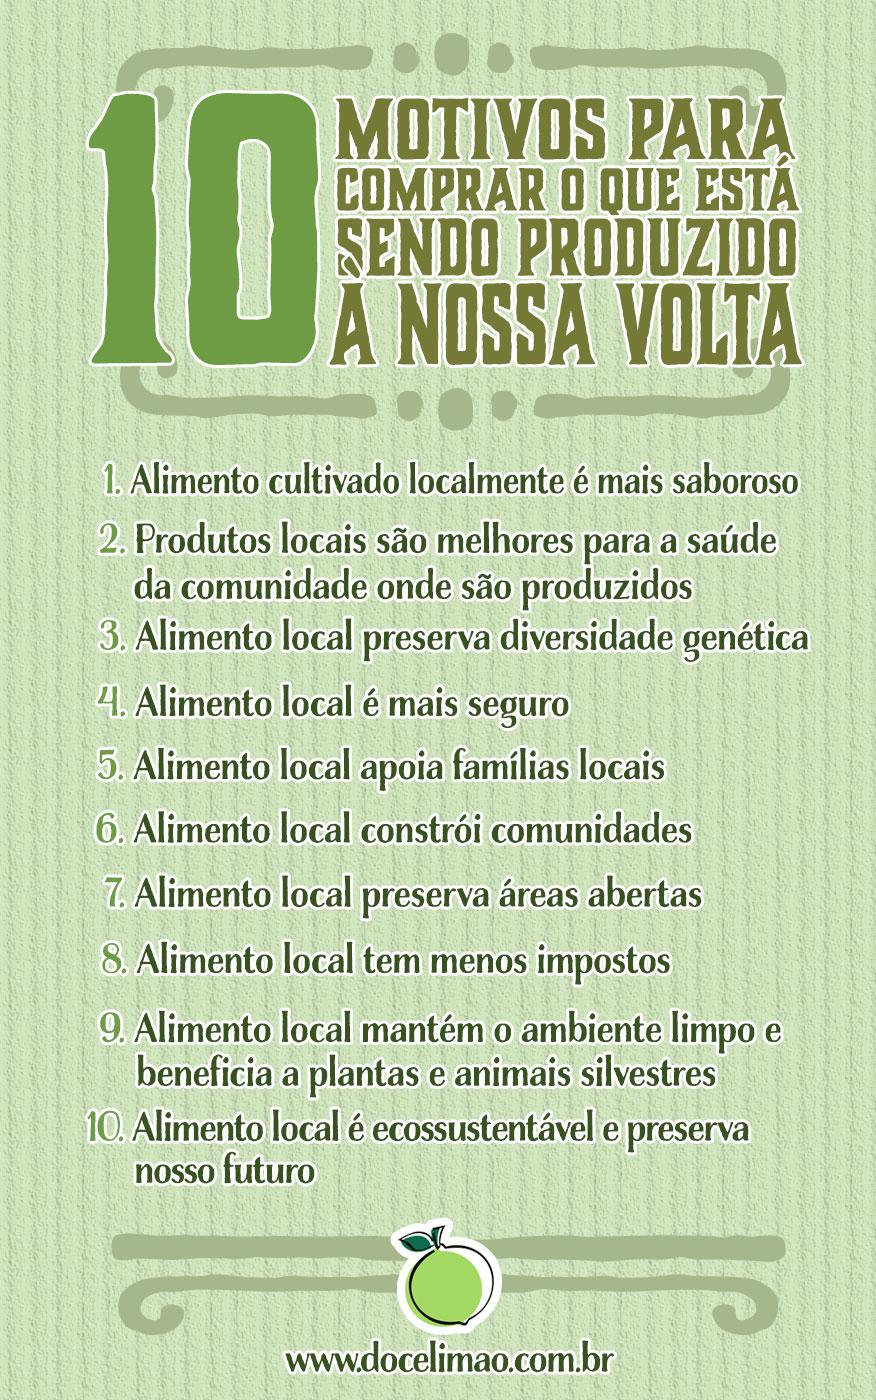 http://www.docelimao.com.br/images/ESSENIOS-PT2.jpg